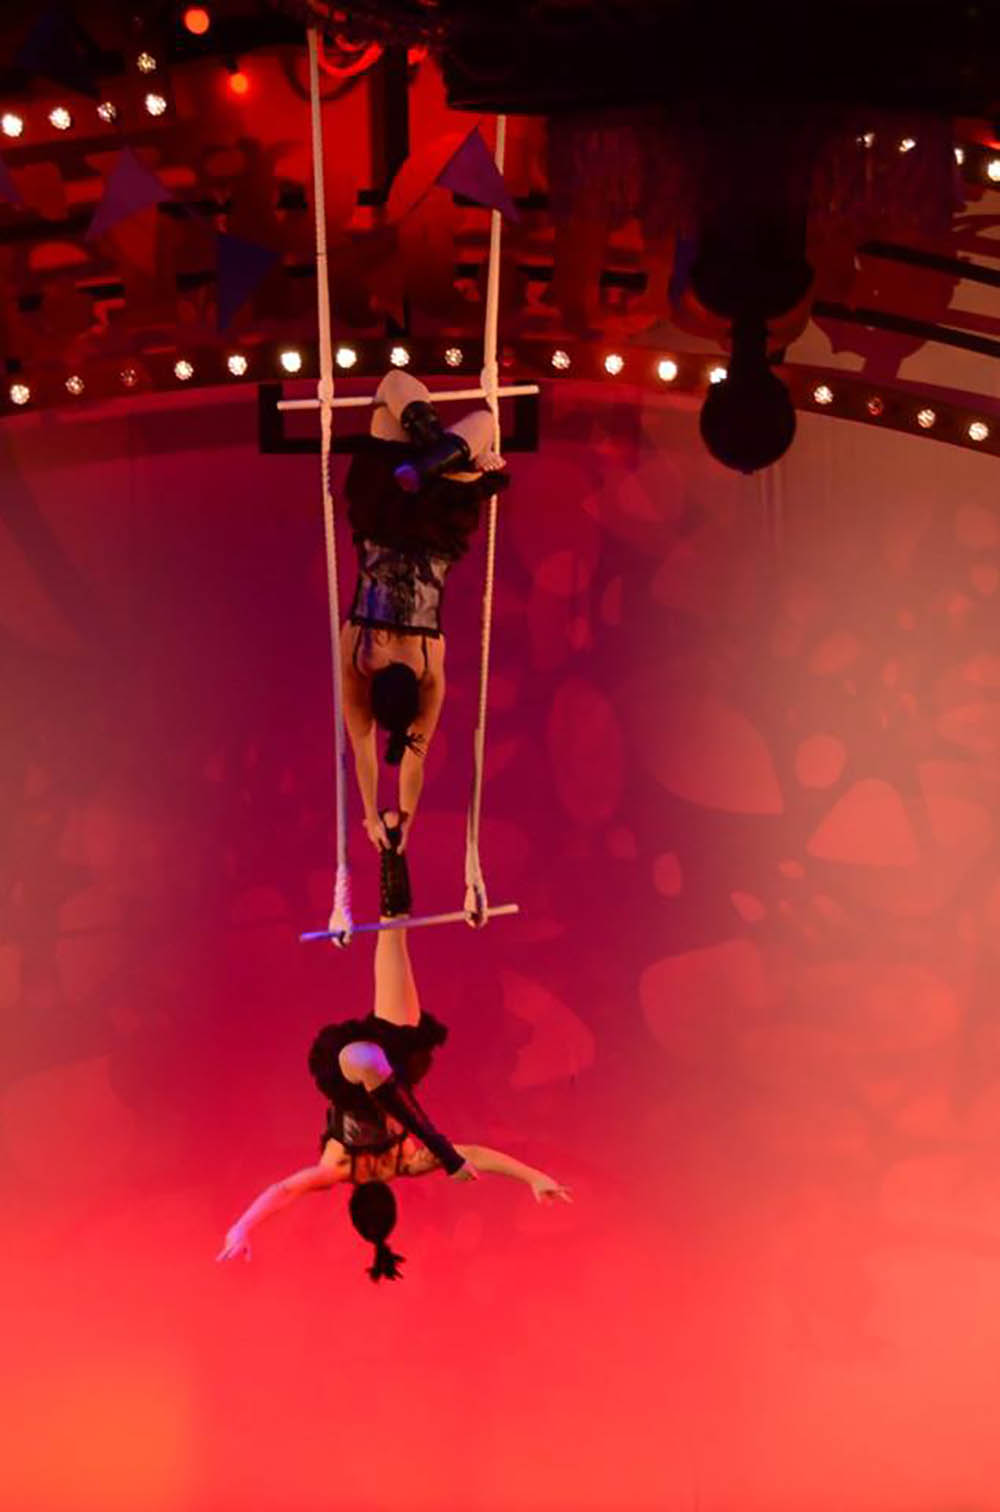 Incandescence_vintagecircus_trapeze